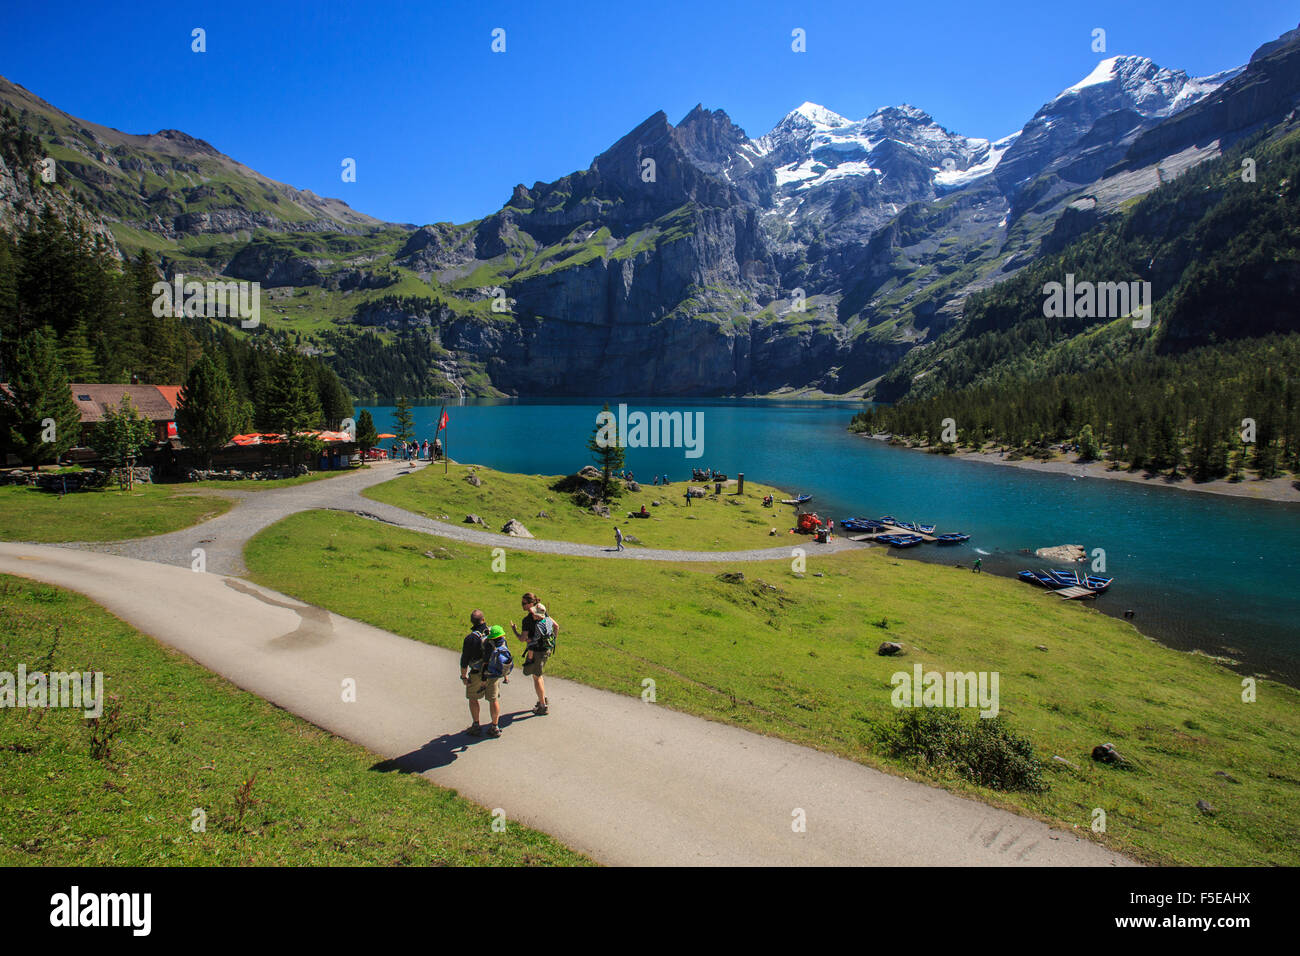 Wanderer rund um Lake Oeschinensee, Kandersteg, Berner Oberland, Kanton Bern, Schweiz, Europa Stockbild